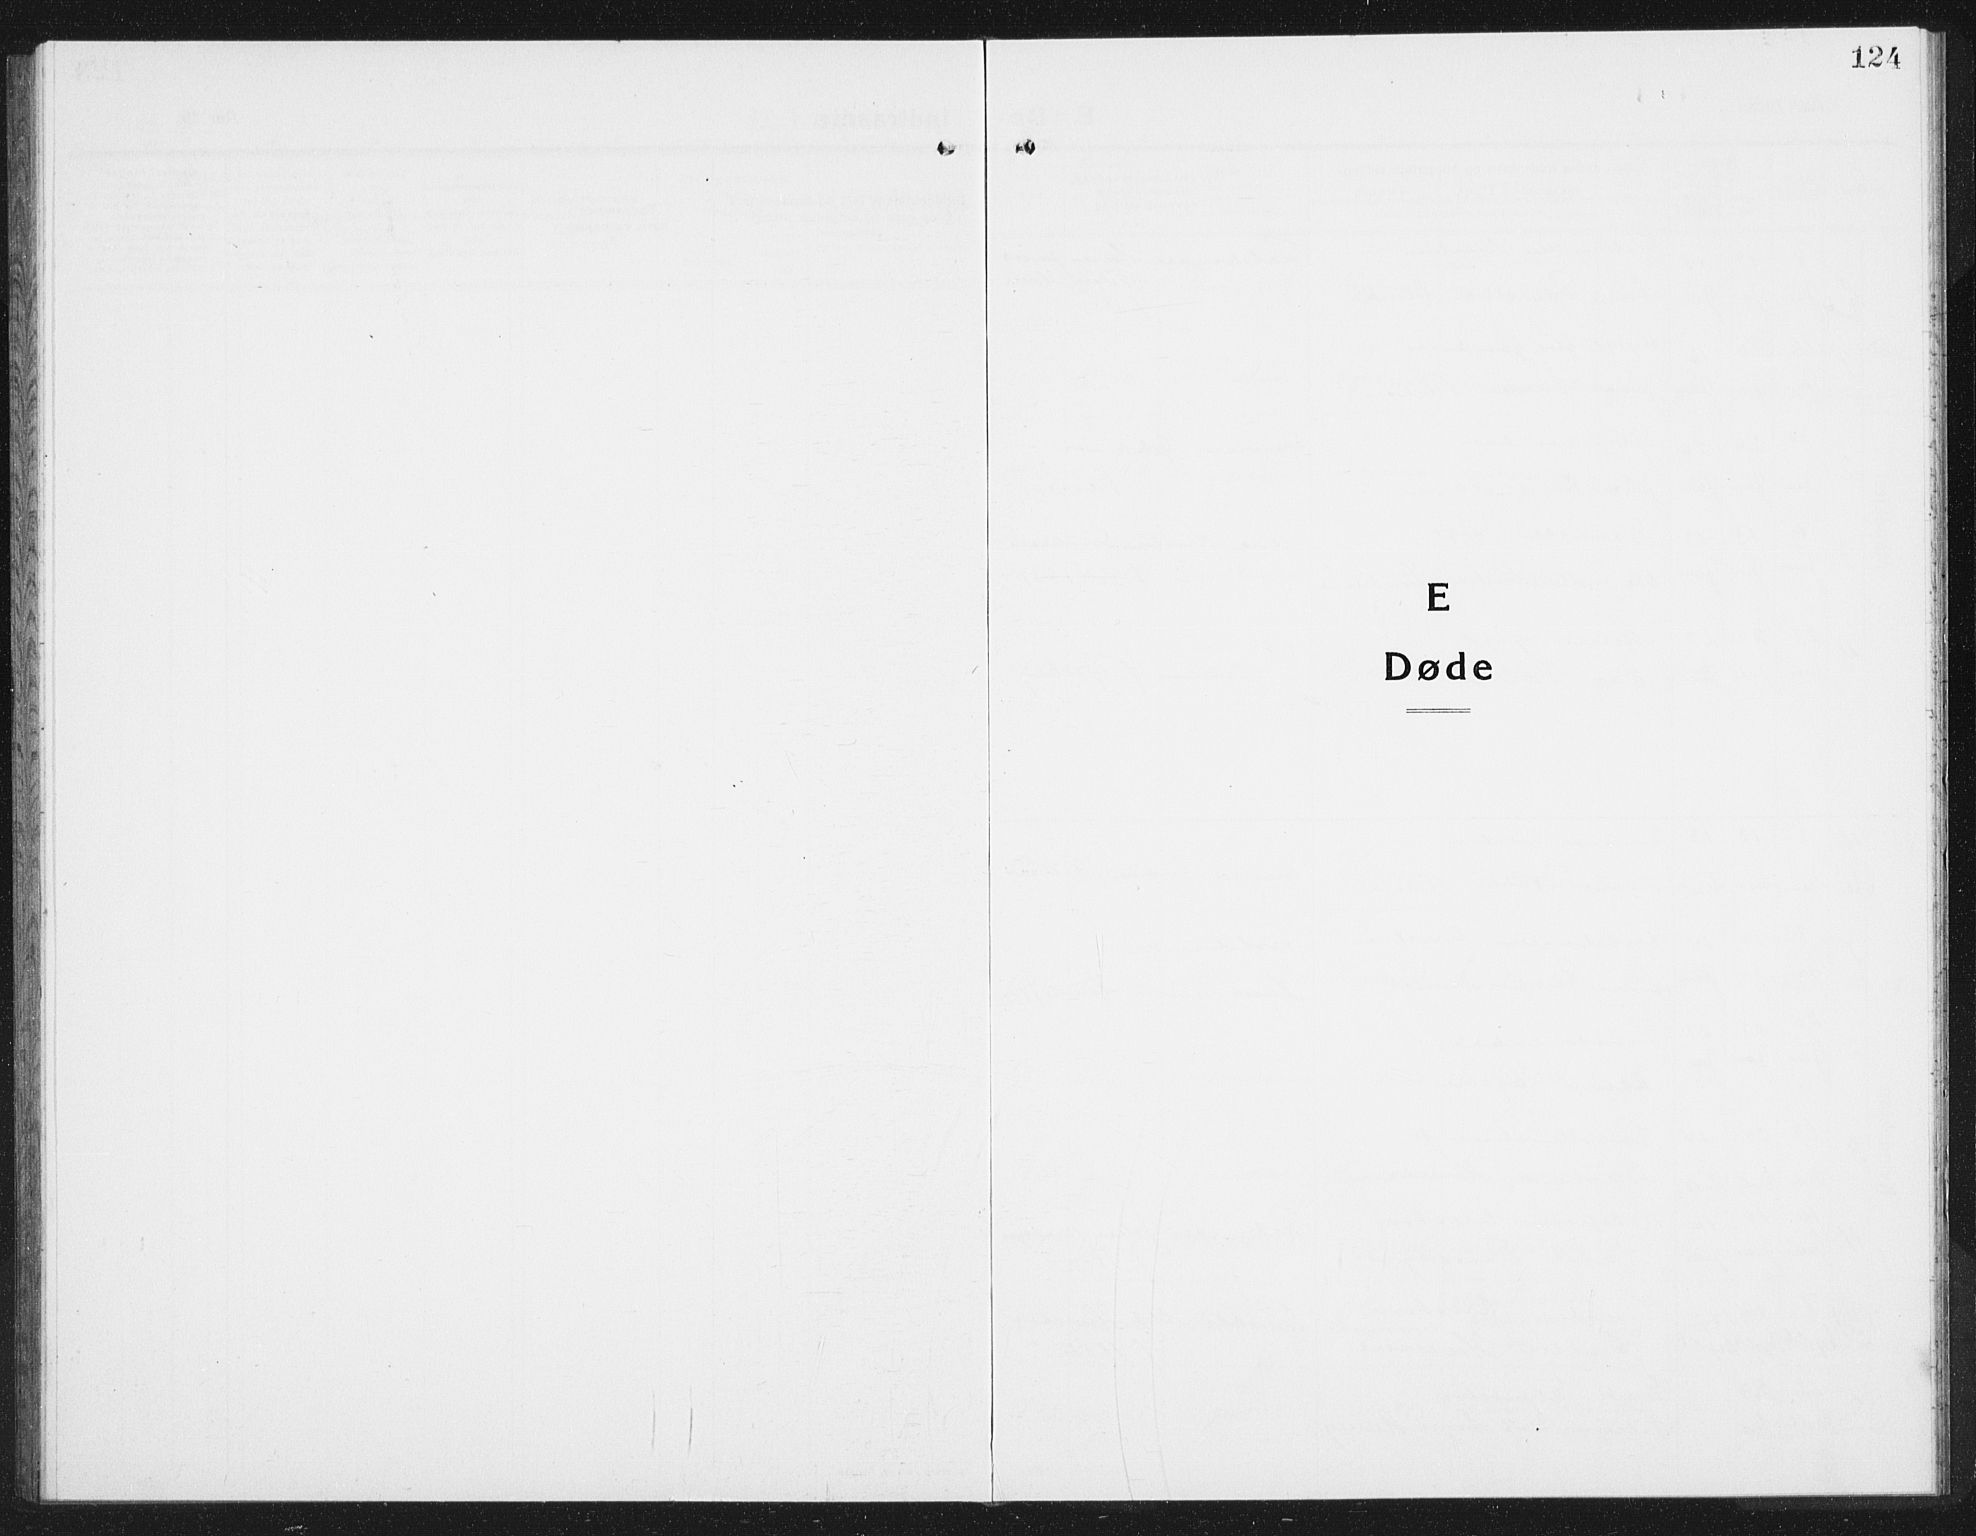 SAST, Kopervik sokneprestkontor, H/Ha/Hab/L0006: Klokkerbok nr. B 6, 1918-1942, s. 124